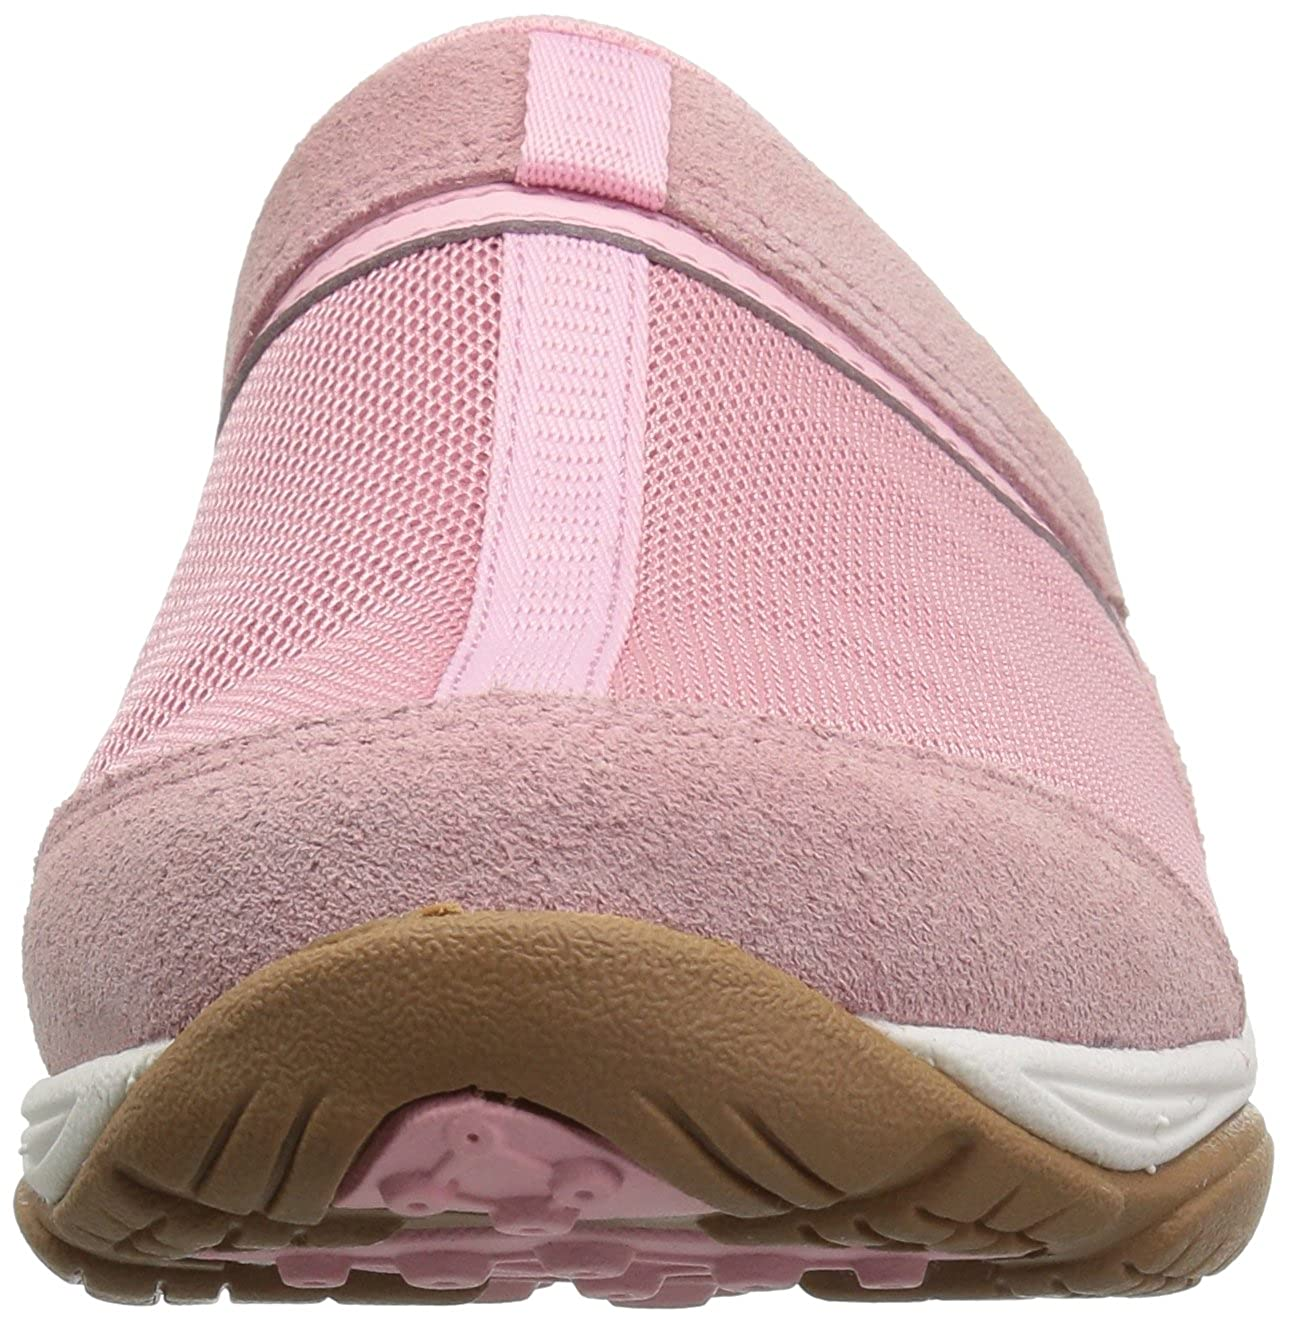 Easy Easy Easy Spirit Women's 7 M US|Pink/Pink B07CV59Q5Z 5a919e